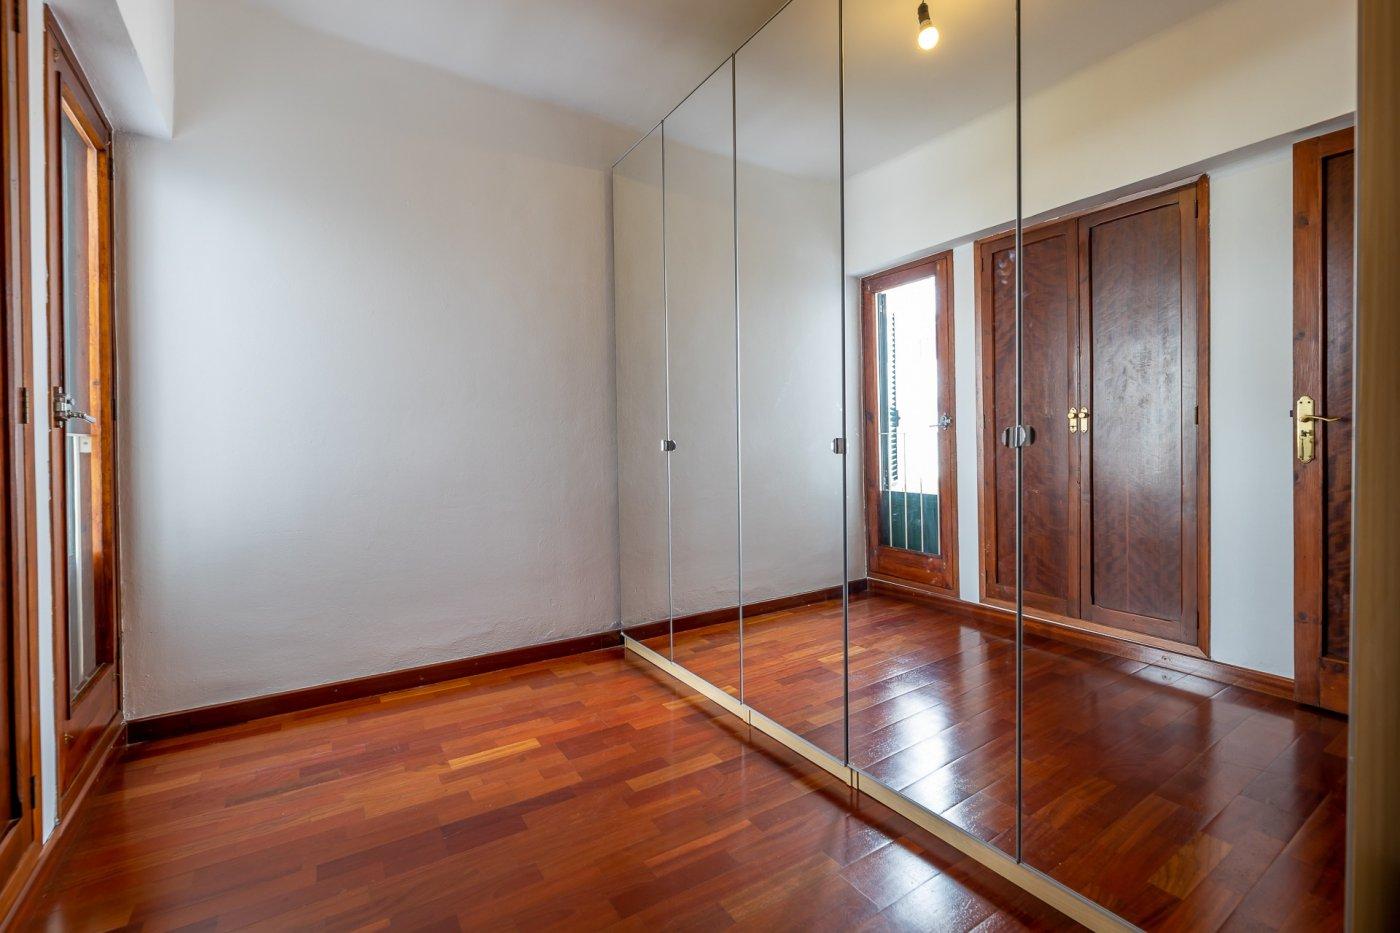 Segundo piso sin ascensor junto a la plaza abu yaya. - imagenInmueble8